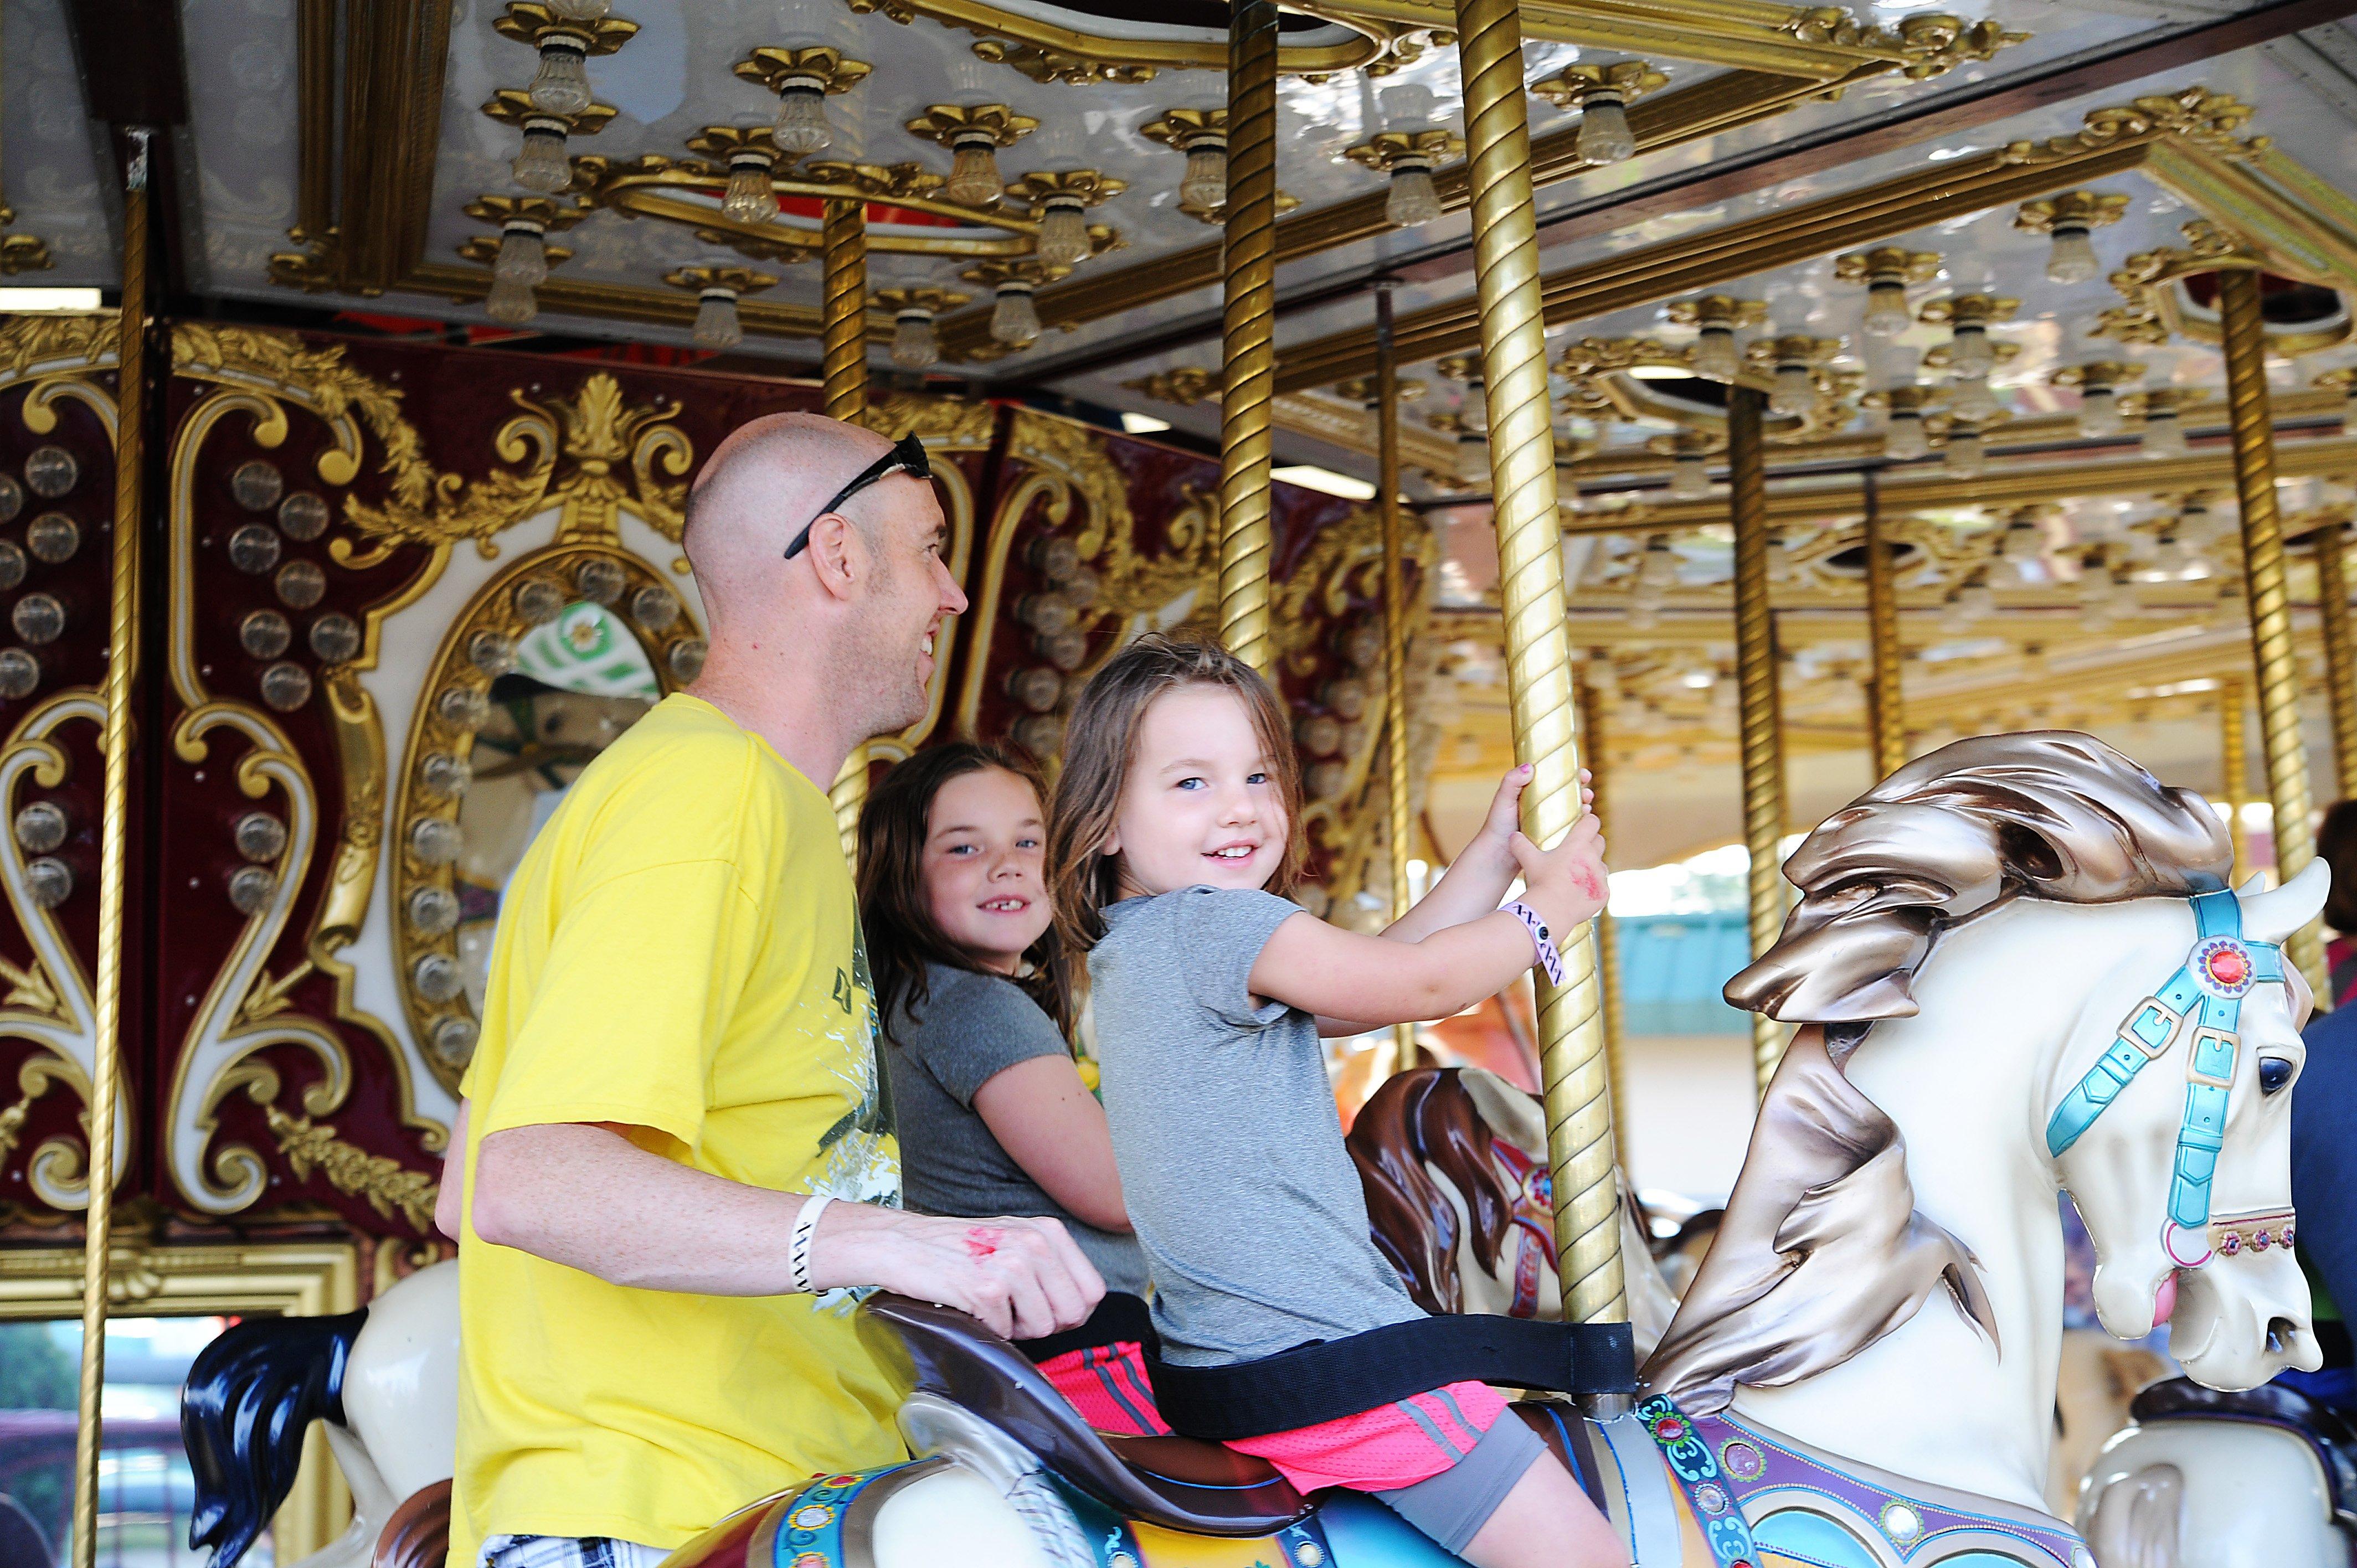 Families having fun on the Classic Carousel in Funtown USA Ride Park